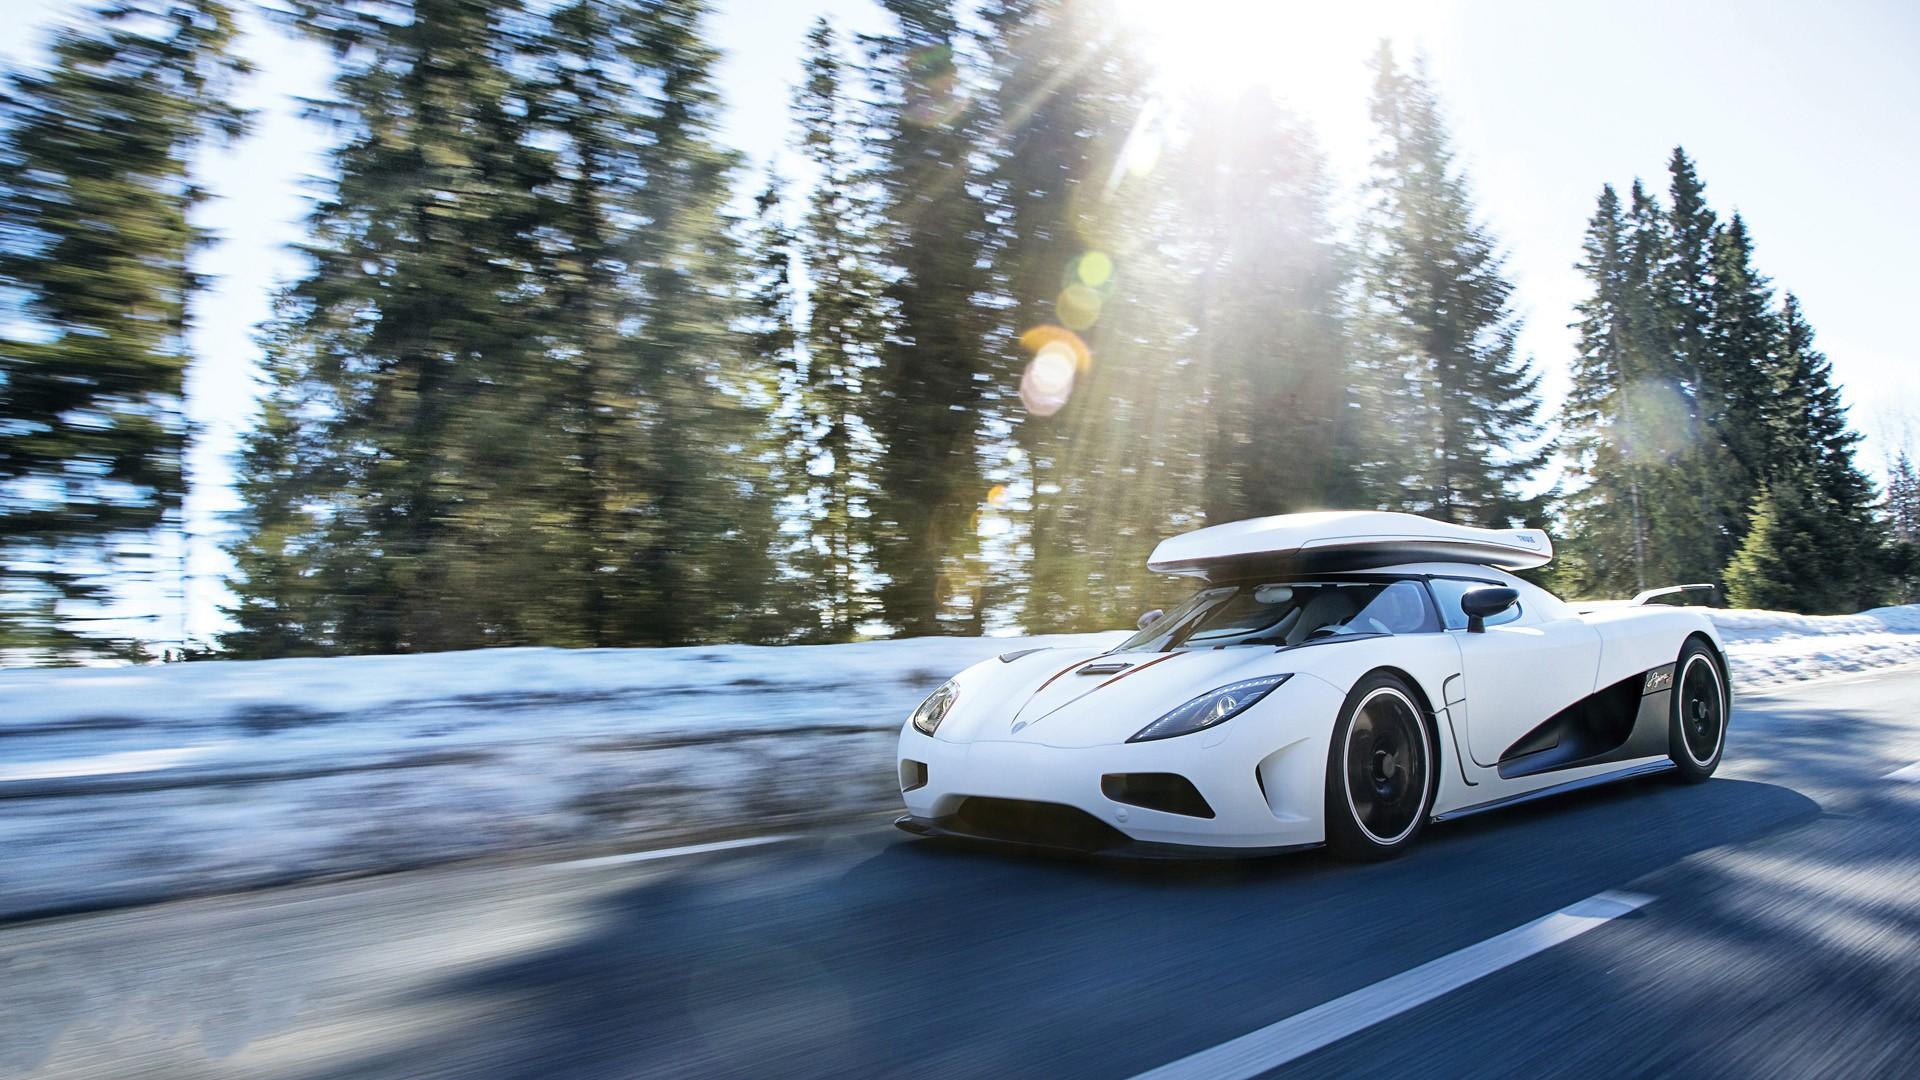 Car Snow Vehicle Sports Car Koenigsegg Agera R Koenigsegg Performance Car  Supercar Land Vehicle Automotive Design